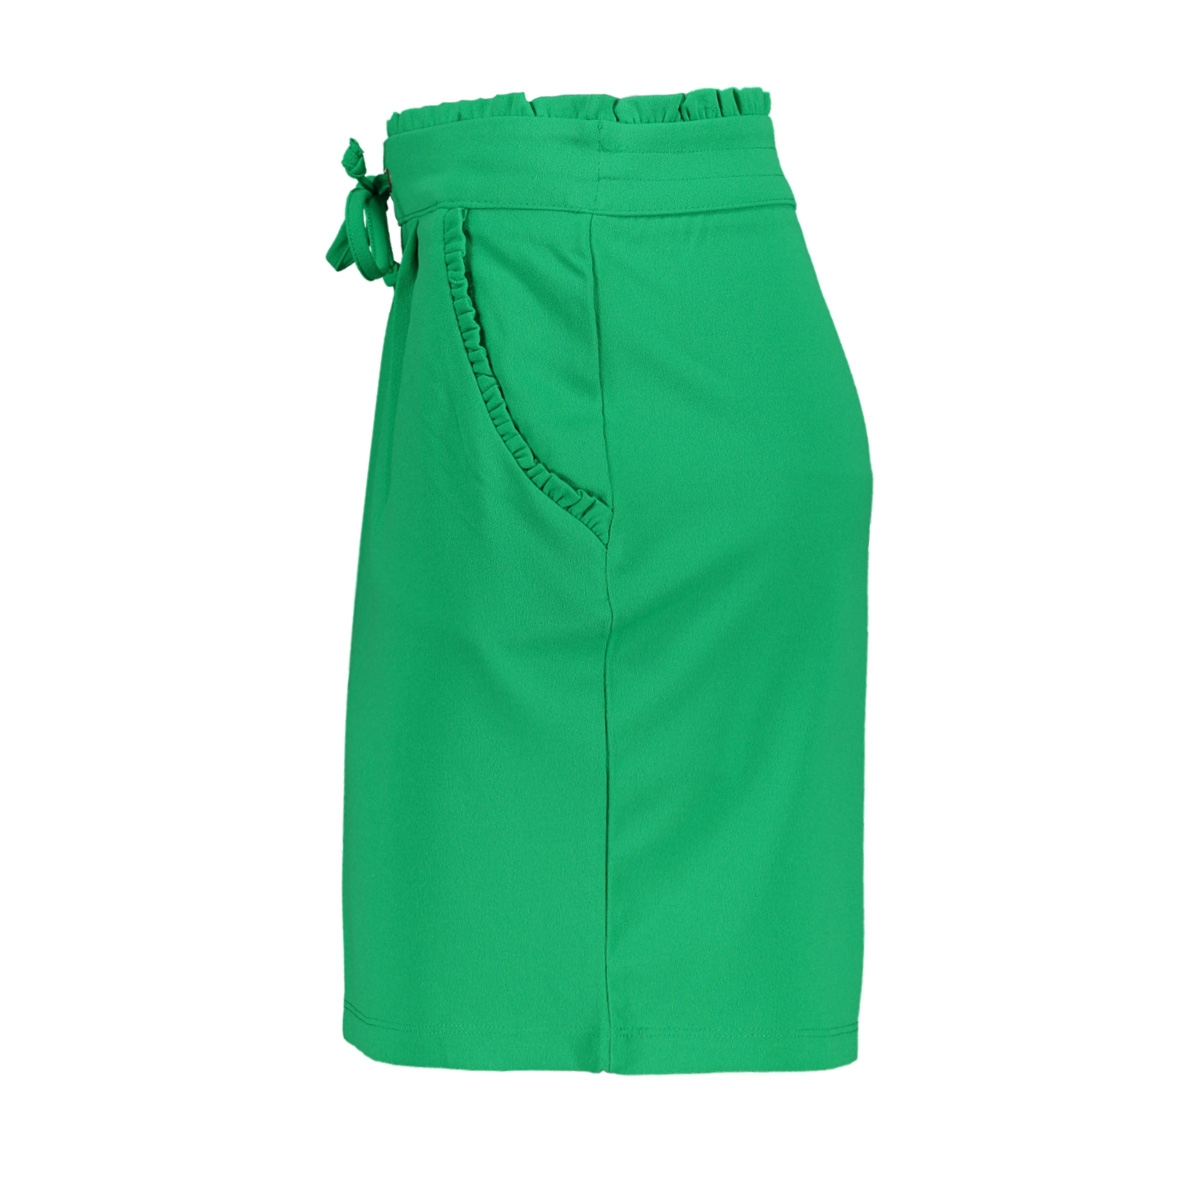 jdycatia treats skirt jrs 15177202 jacqueline de yong rok simply green